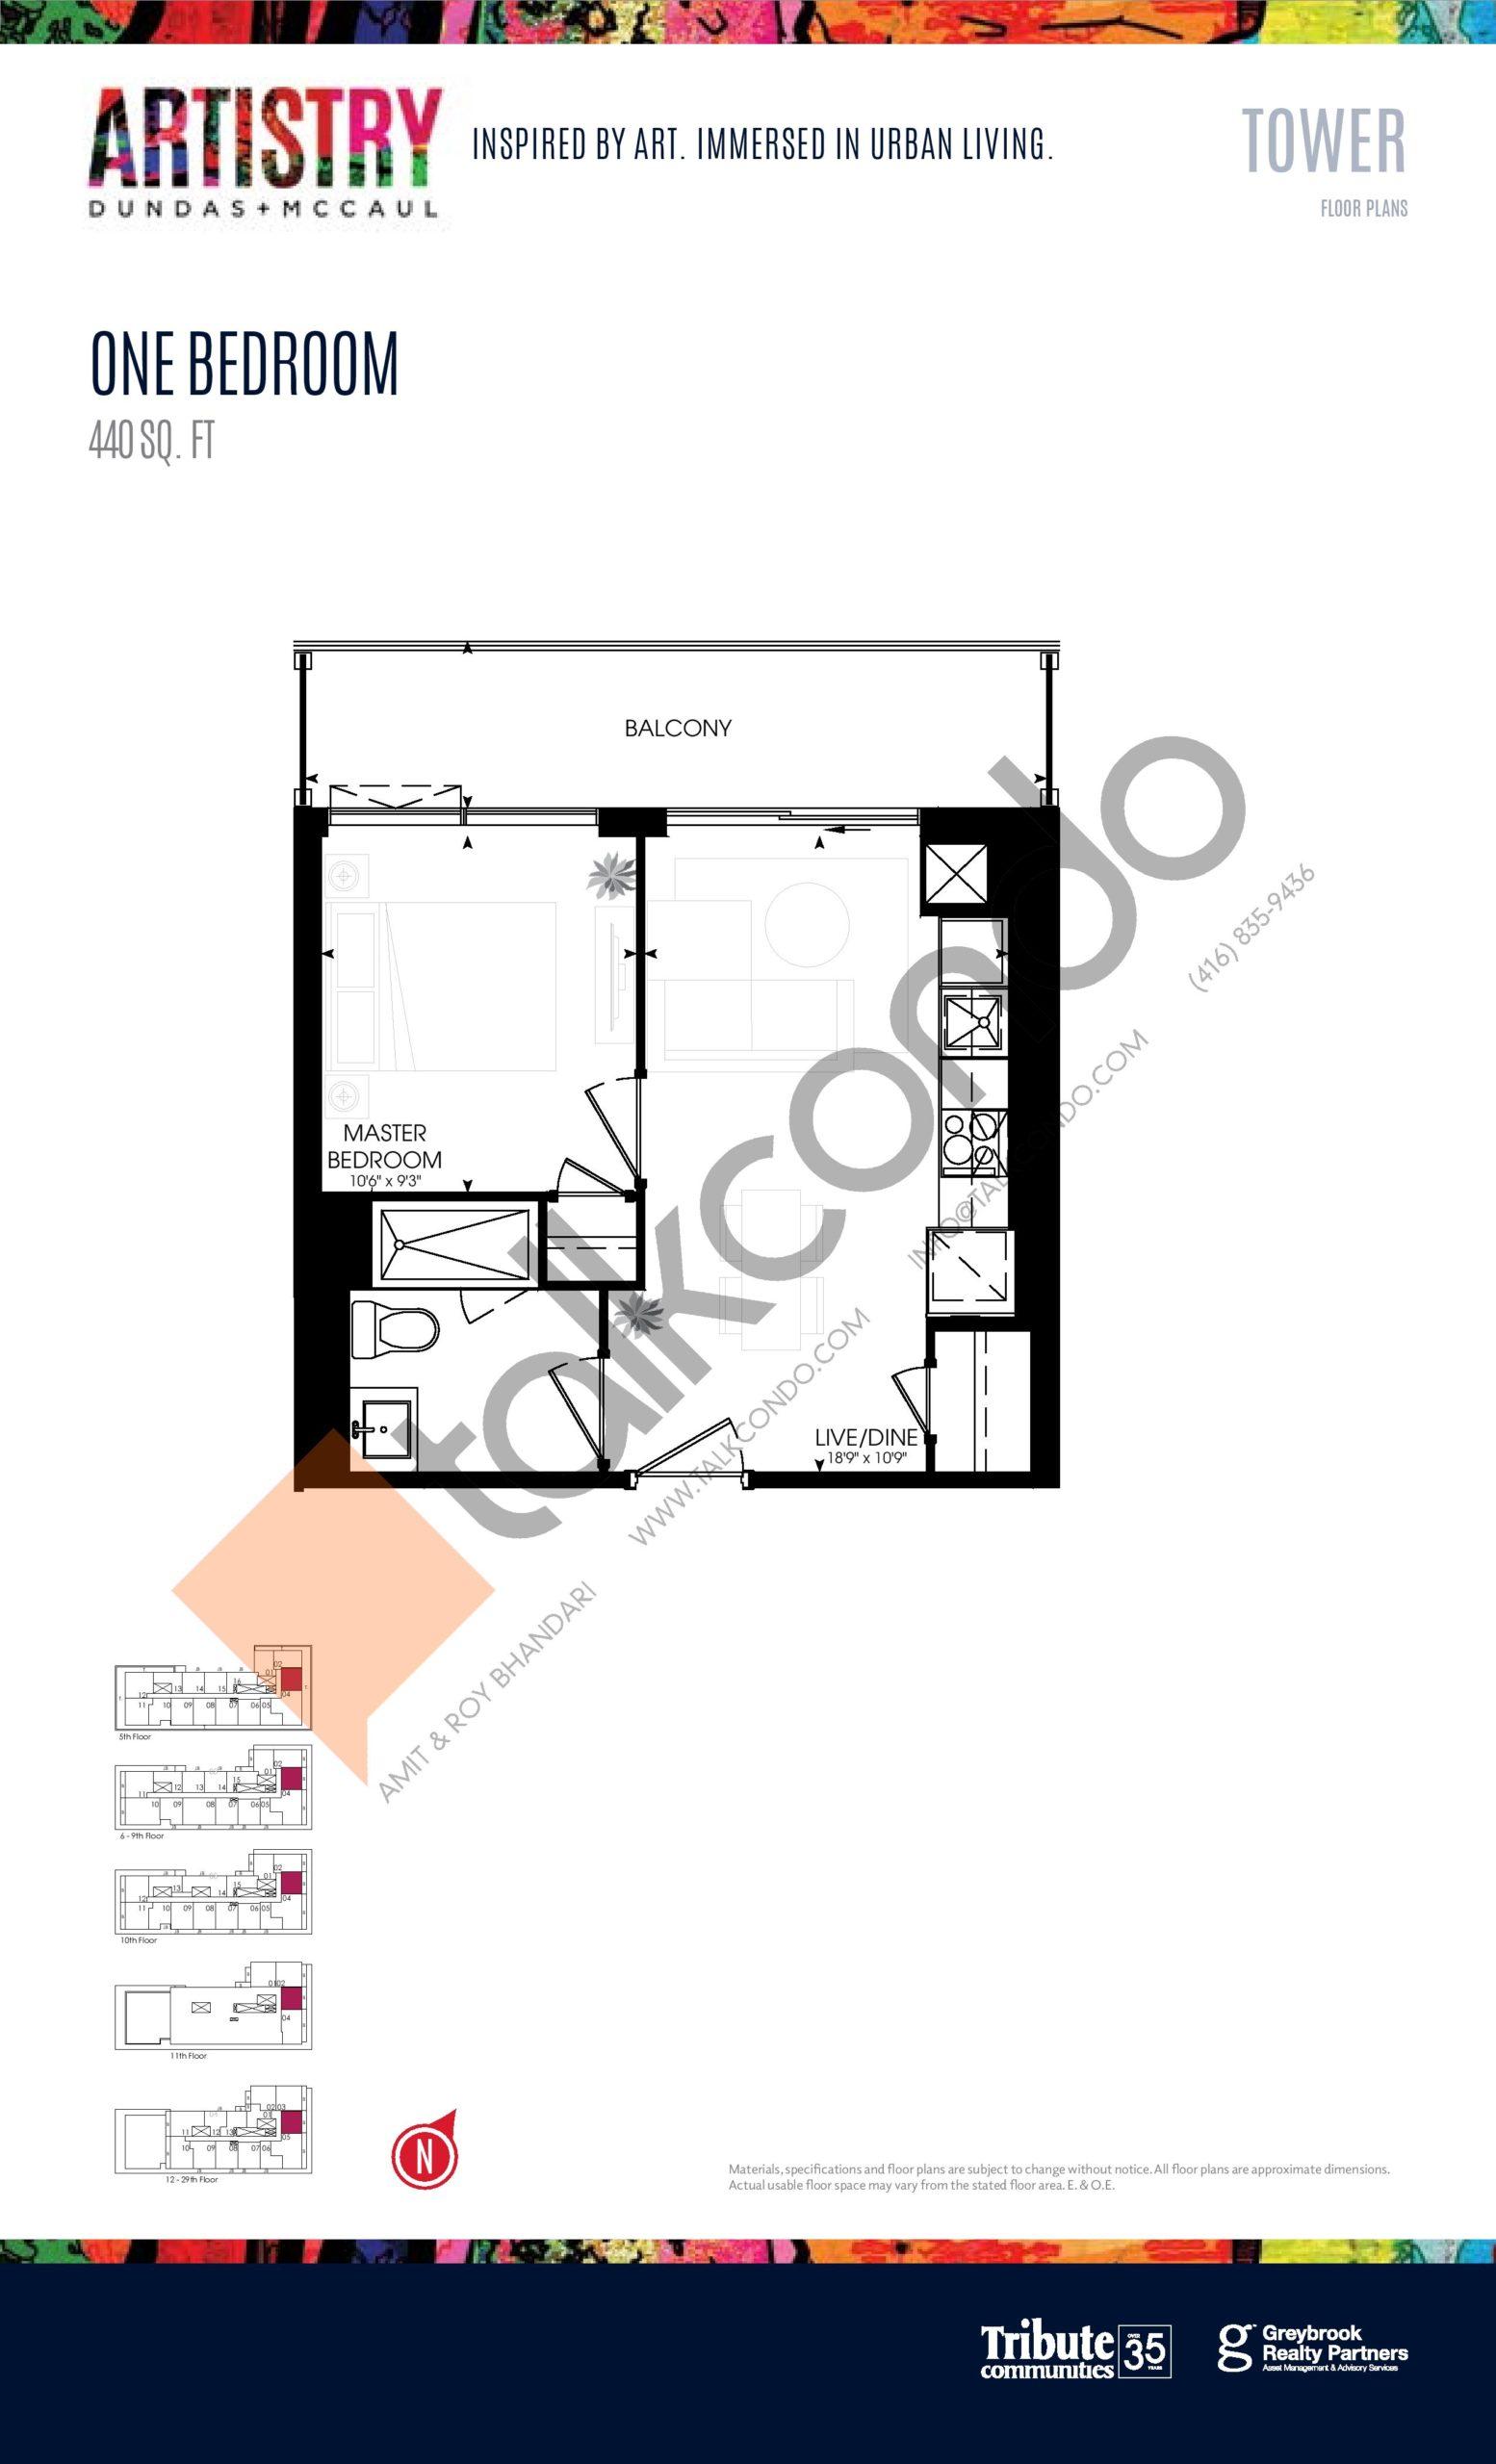 440 sq. ft. - Tower Floor Plan at Artistry Condos - 440 sq.ft